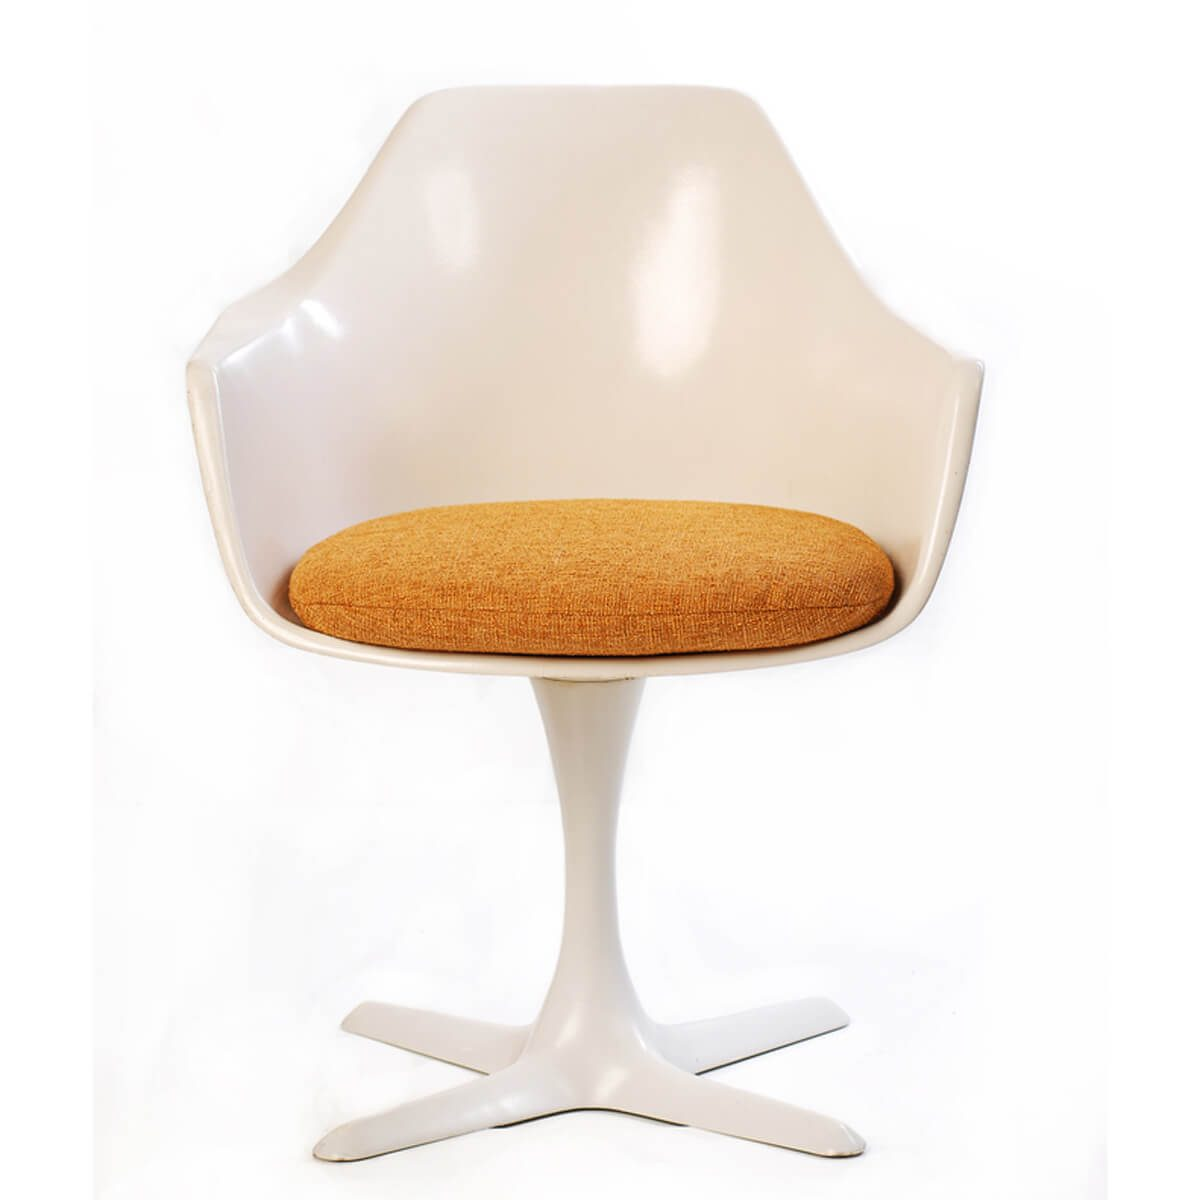 mid-century modern tulip chair